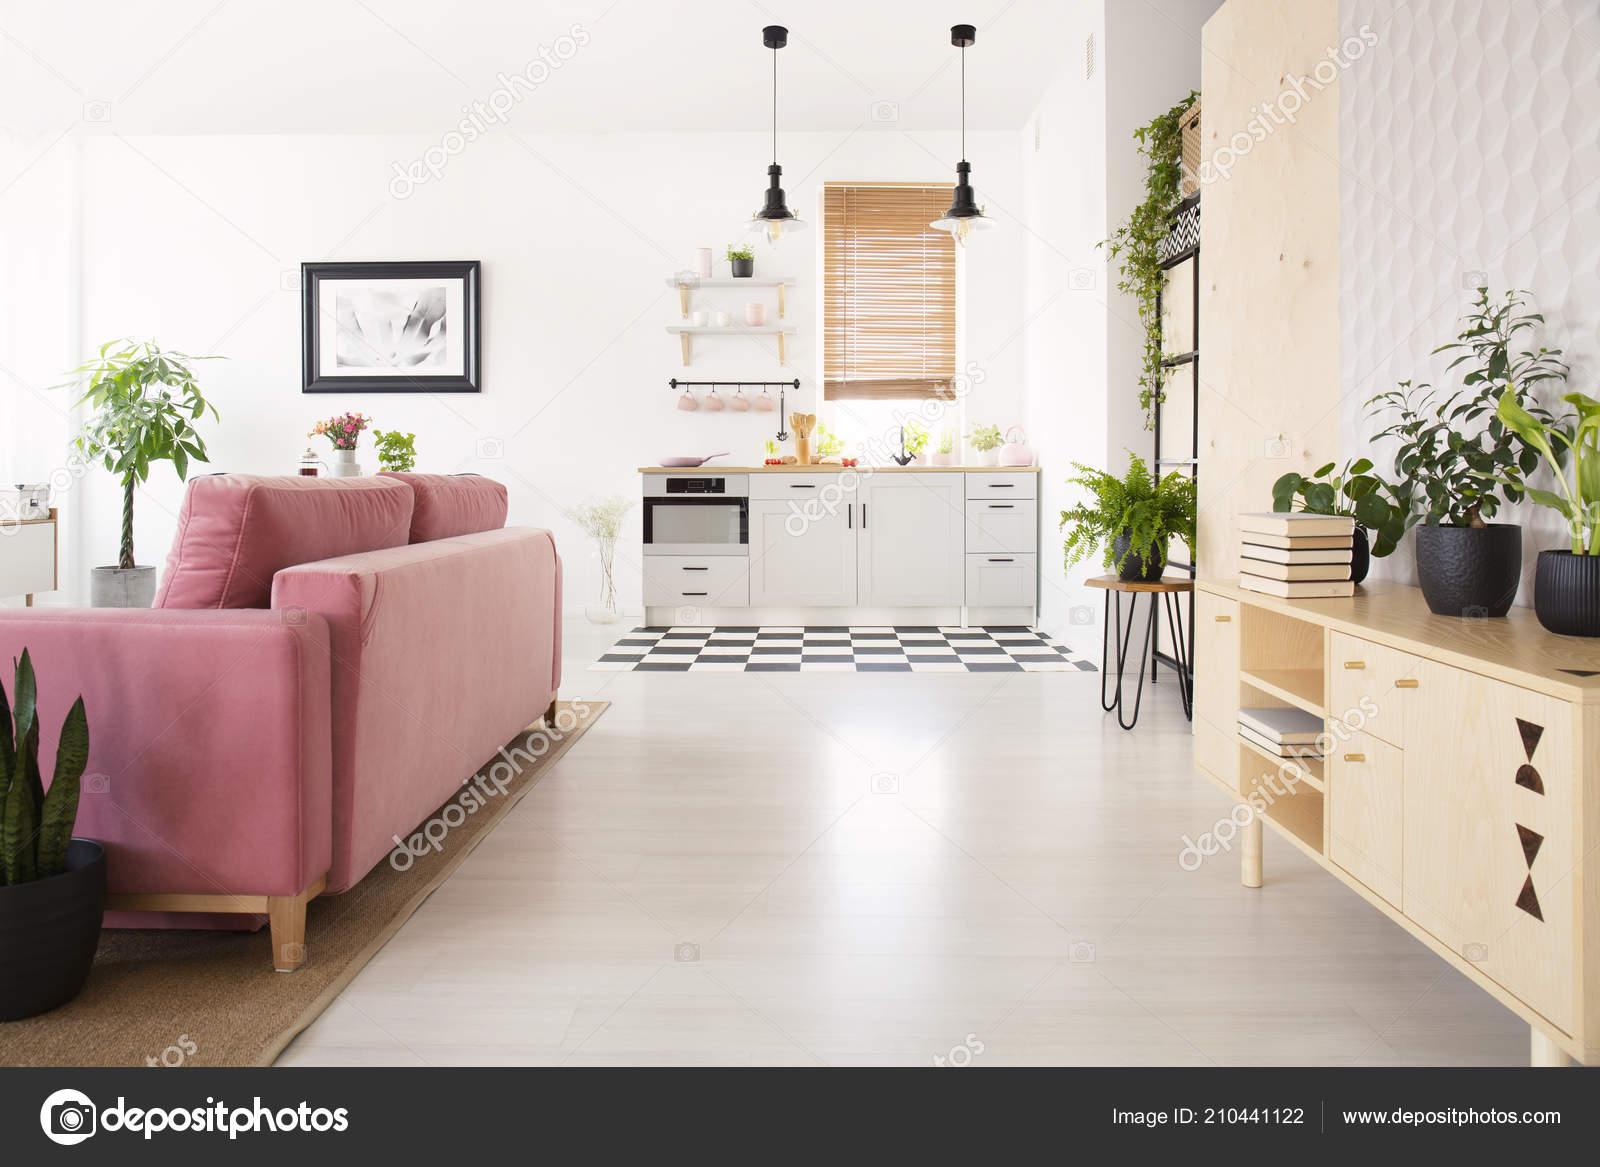 pink kitchen rug cheap motels with kitchens 明亮的起居室的真实照片与许多新鲜的植物木橱柜与书粉红色休息室和小厨房 明亮的起居室的真实照片与许多新鲜的植物 木橱柜与书 粉红色休息室和小厨房 照片作者photographee eu